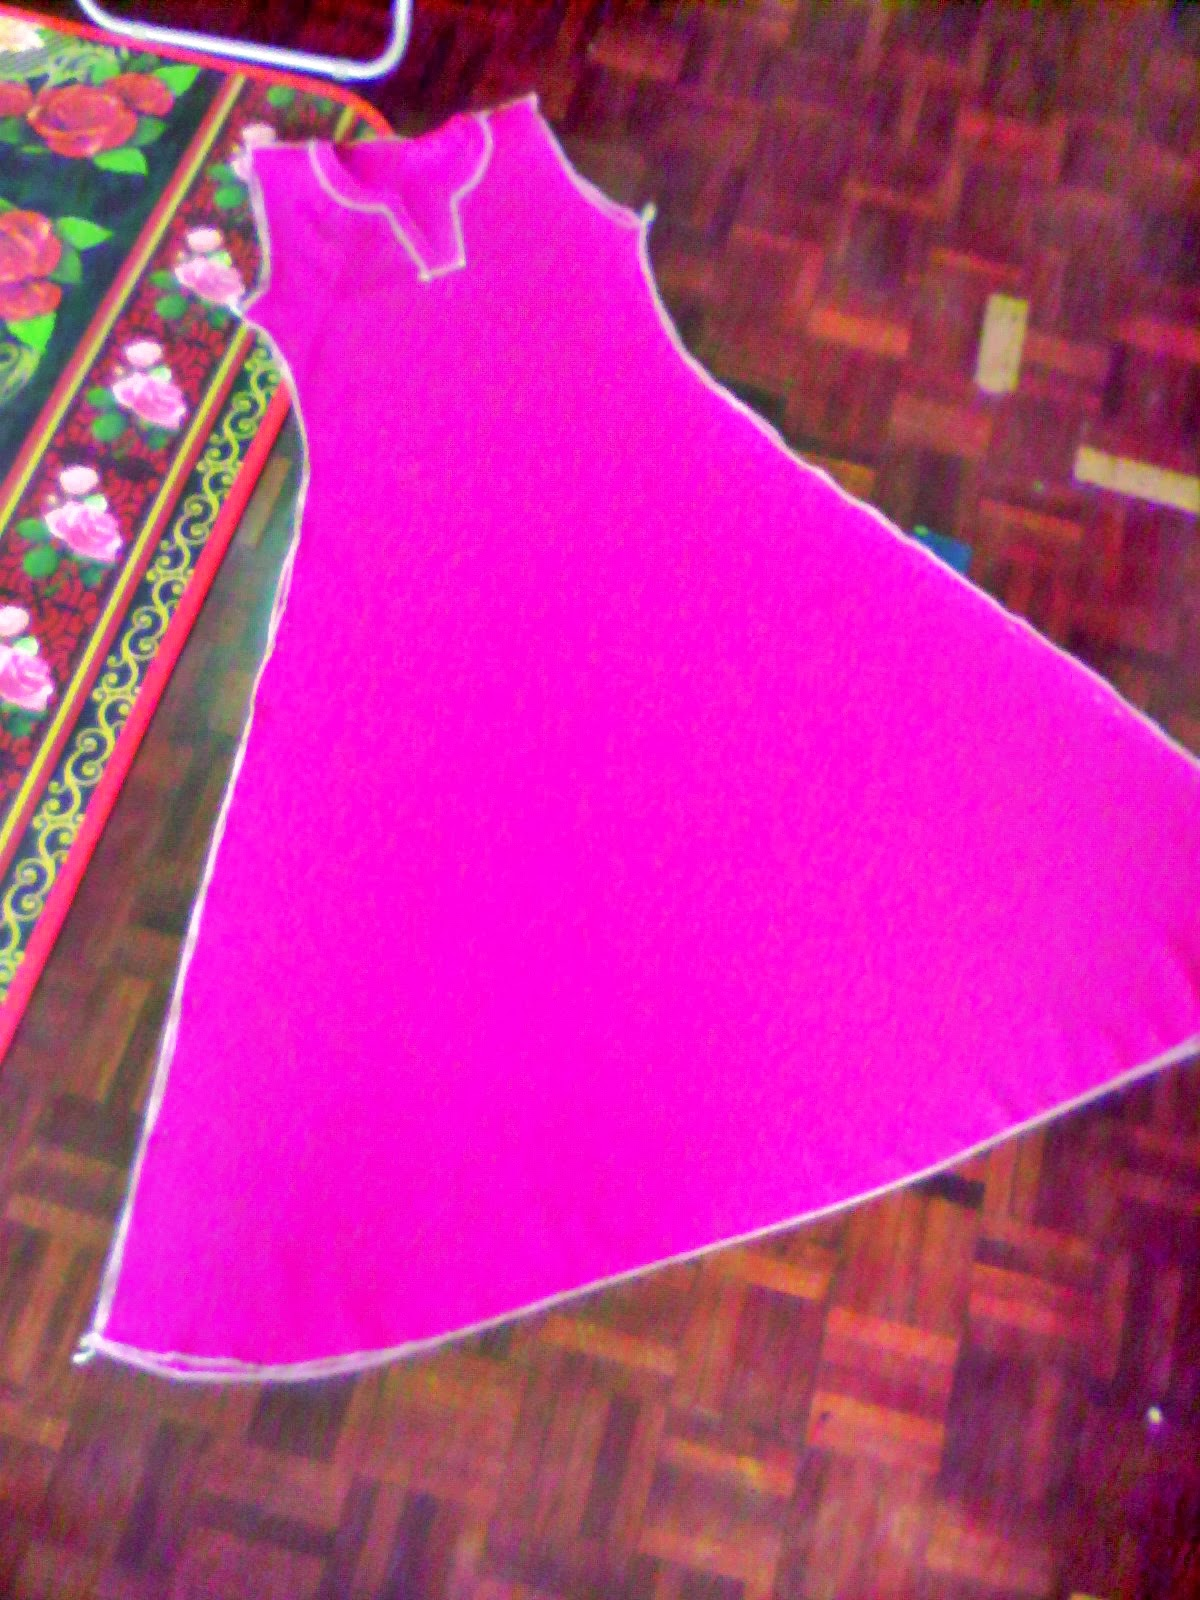 assalamualaikumm lagi pola jubah princess cut buat pola kita dah kan